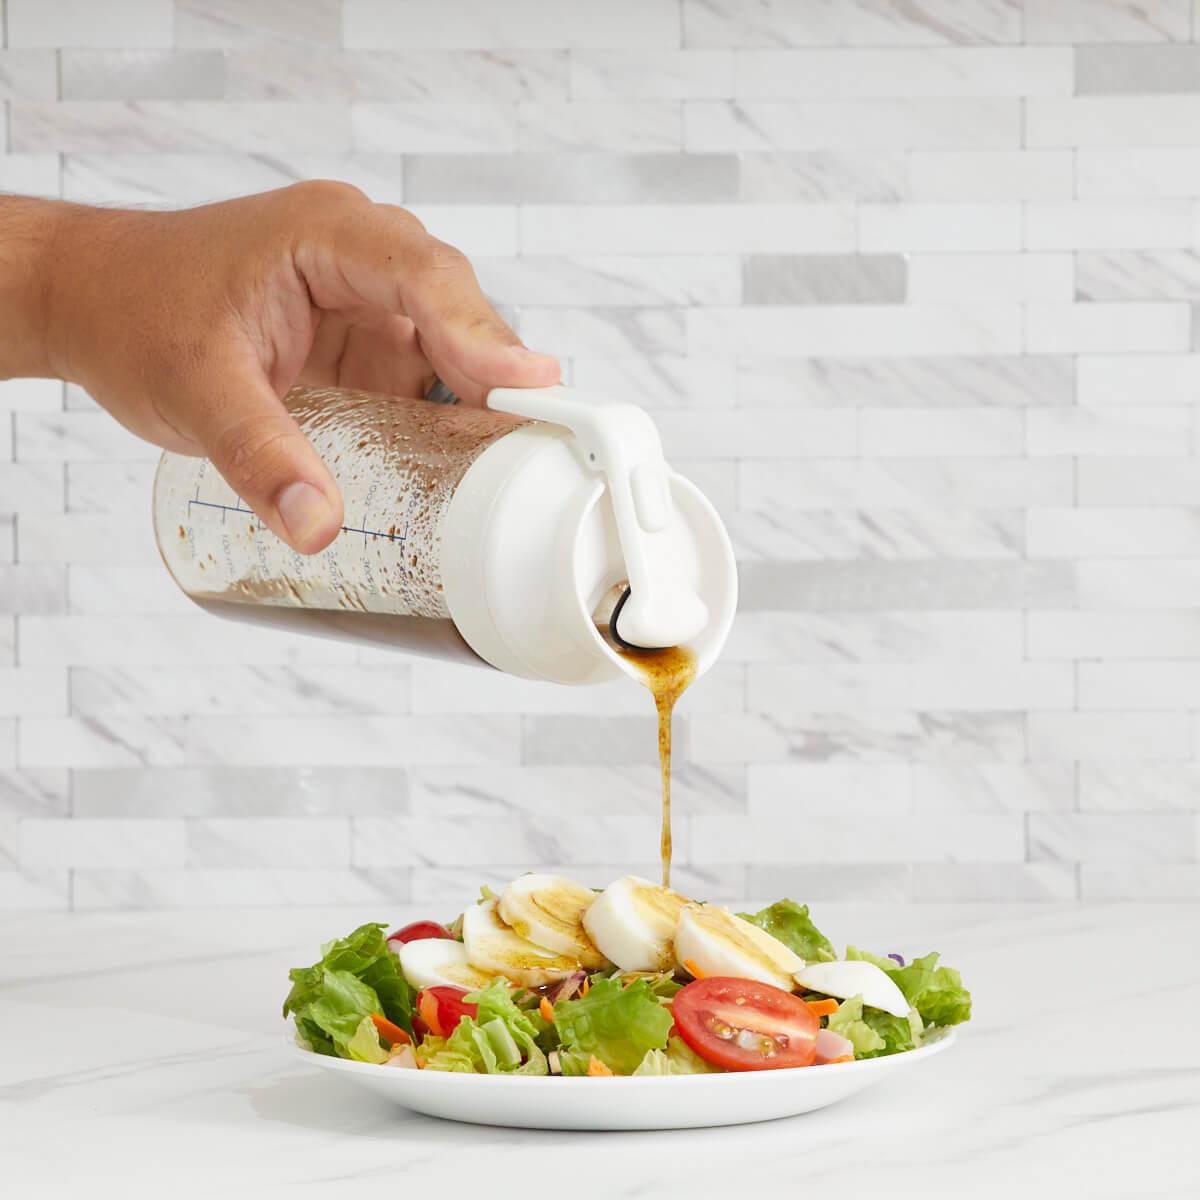 WW by Misto Salad Dressing Shaker - lifestyle 3